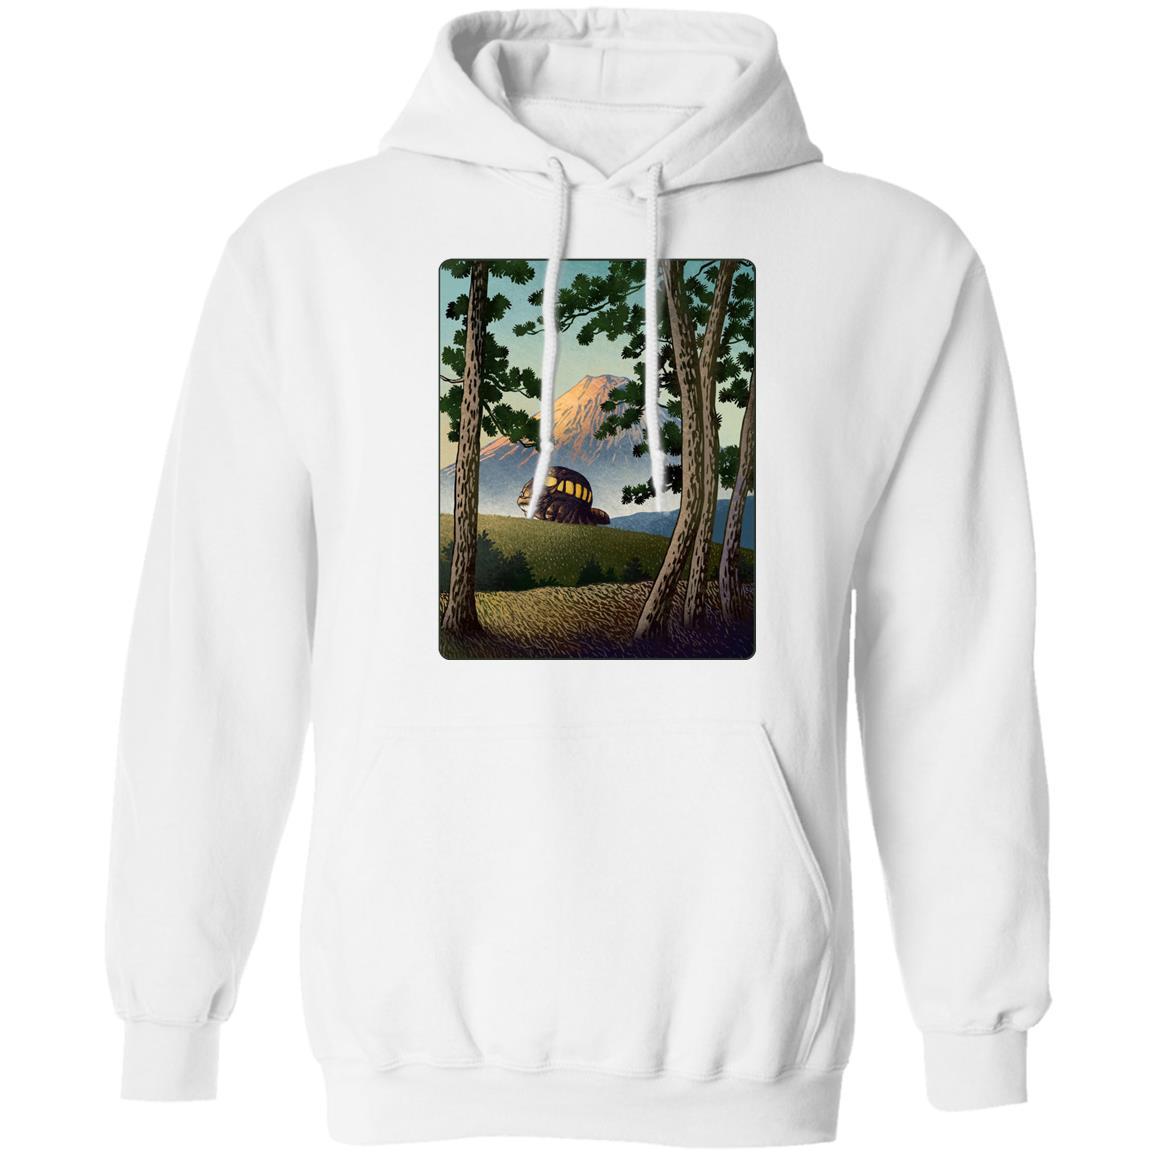 My Neighbor Totoro – Catbus Landscape Hoodie